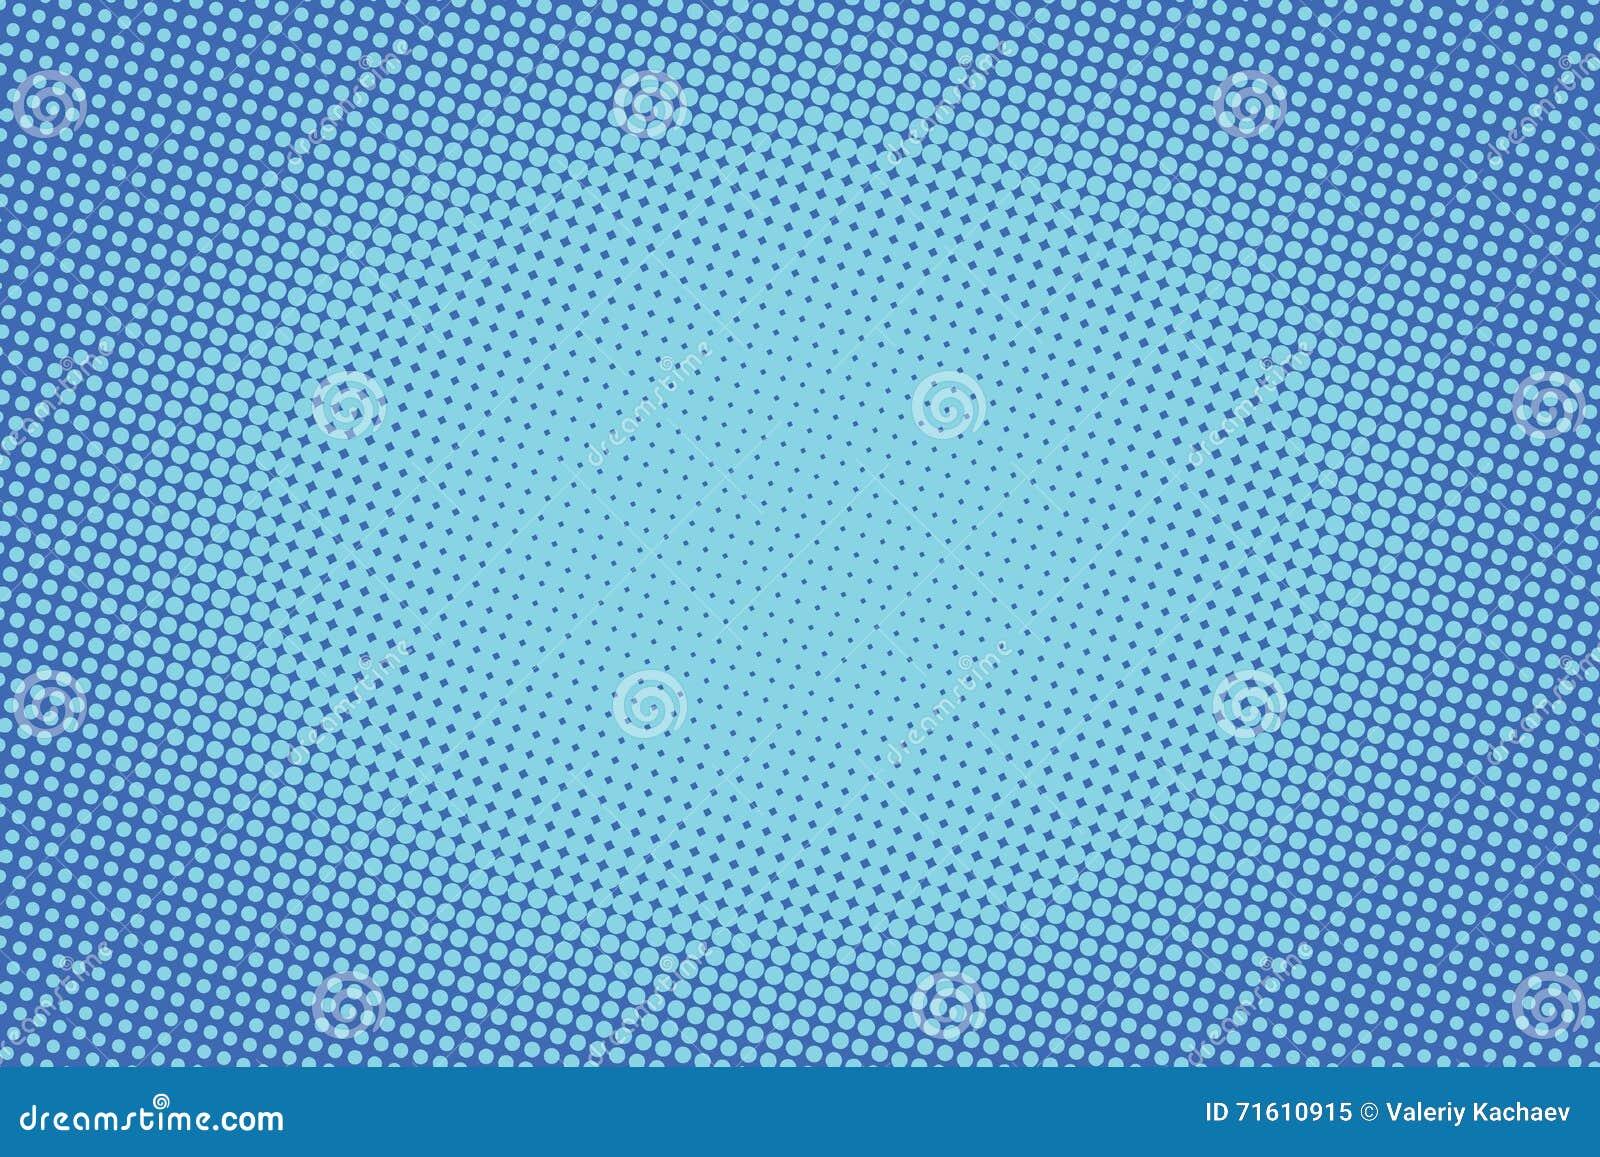 Retro comic blue background raster gradient halftone